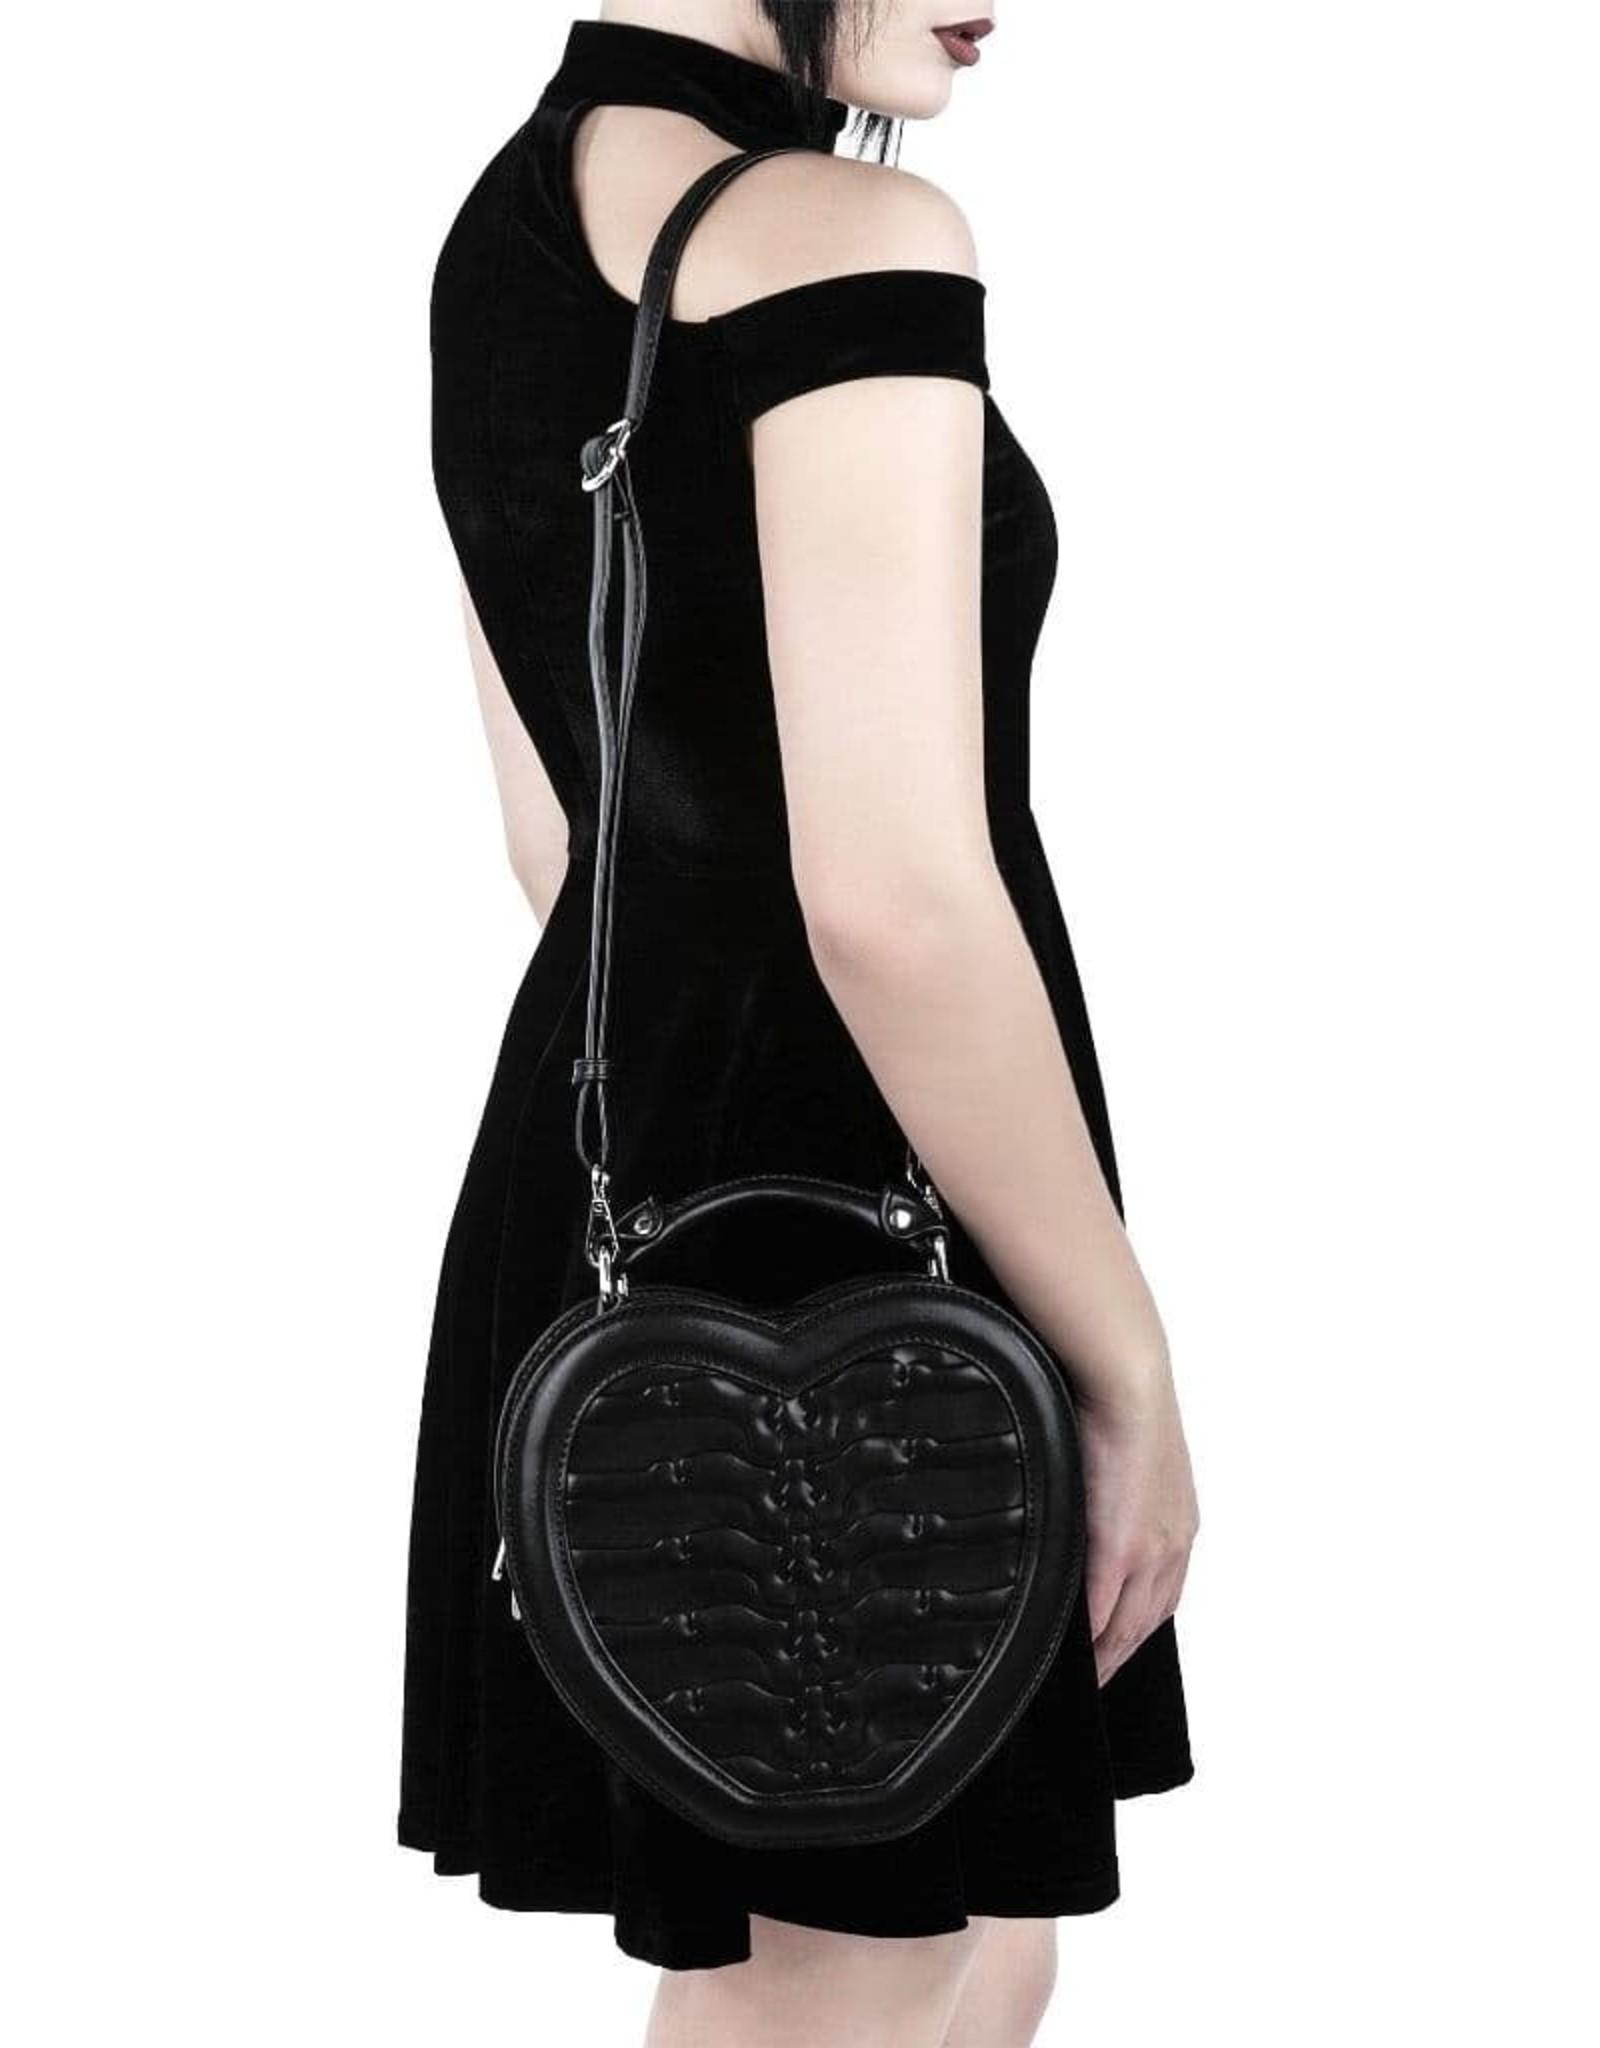 Killstar Gothic bags Steampunk bags - Killstar Black Heartz handbag